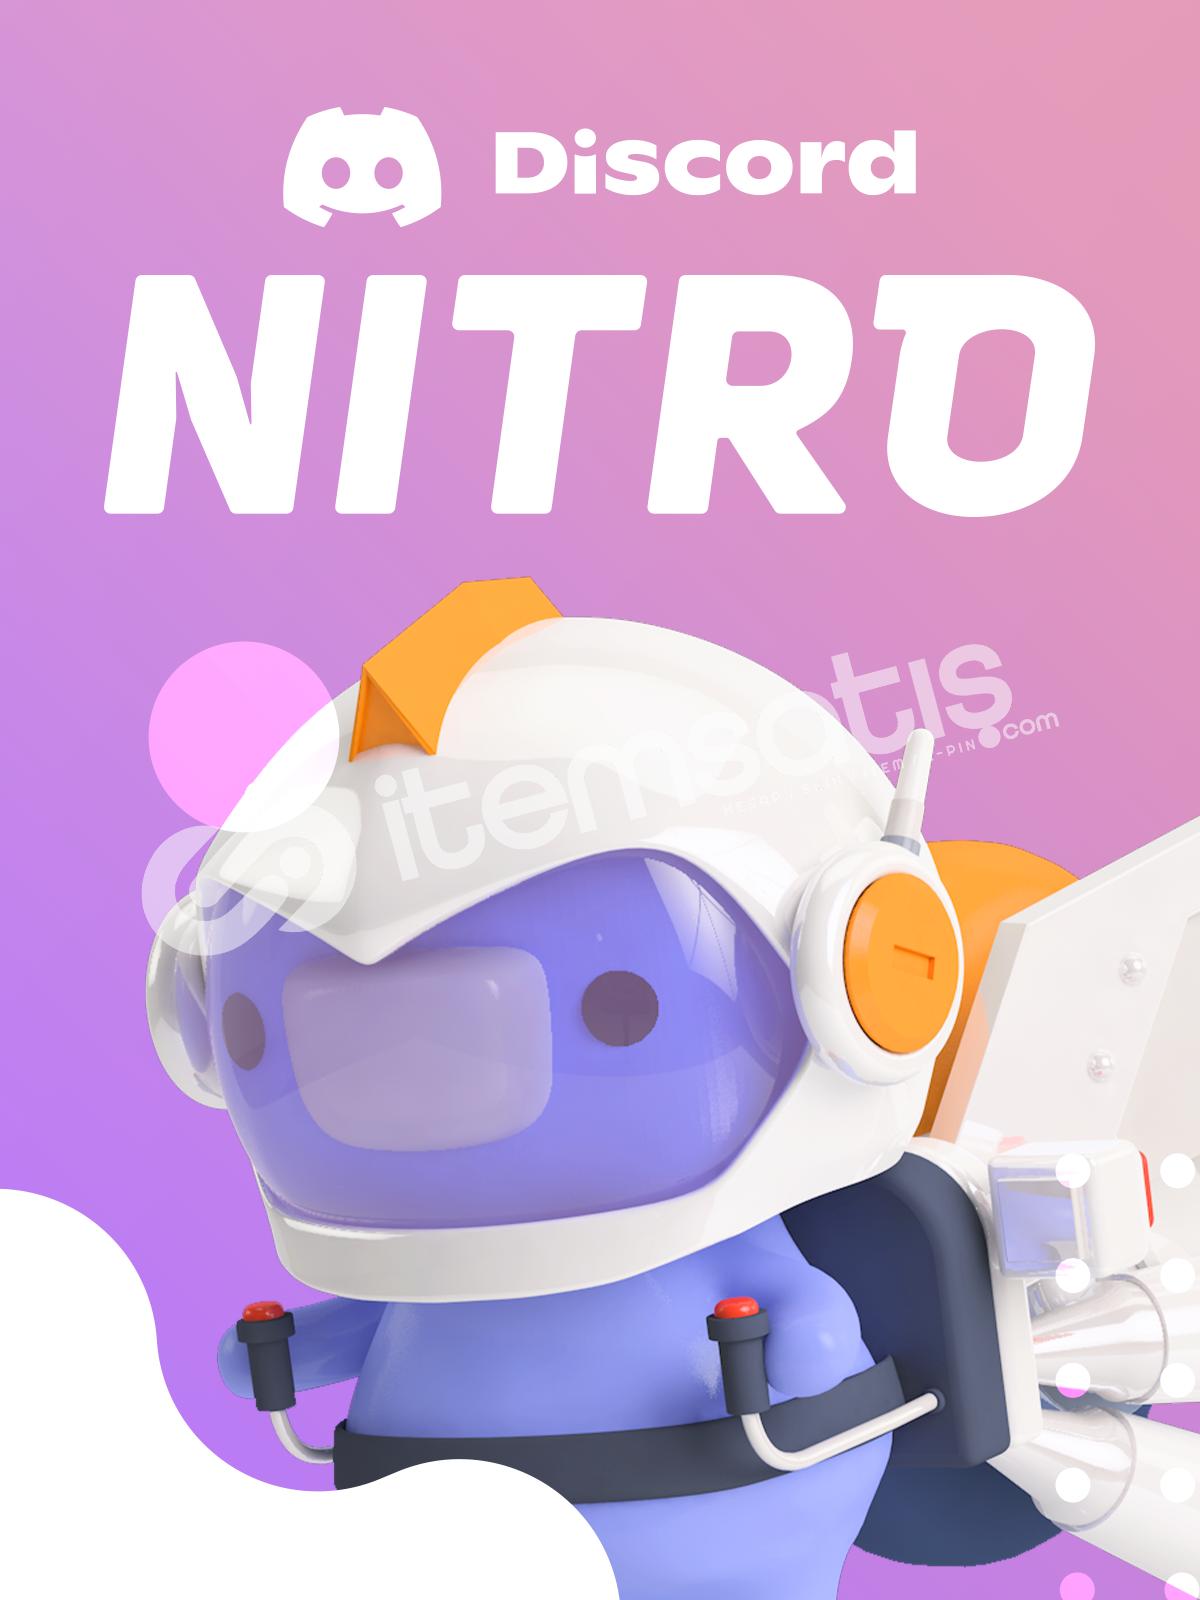 Discord 1 Aylık Nitro Classicli Hesap